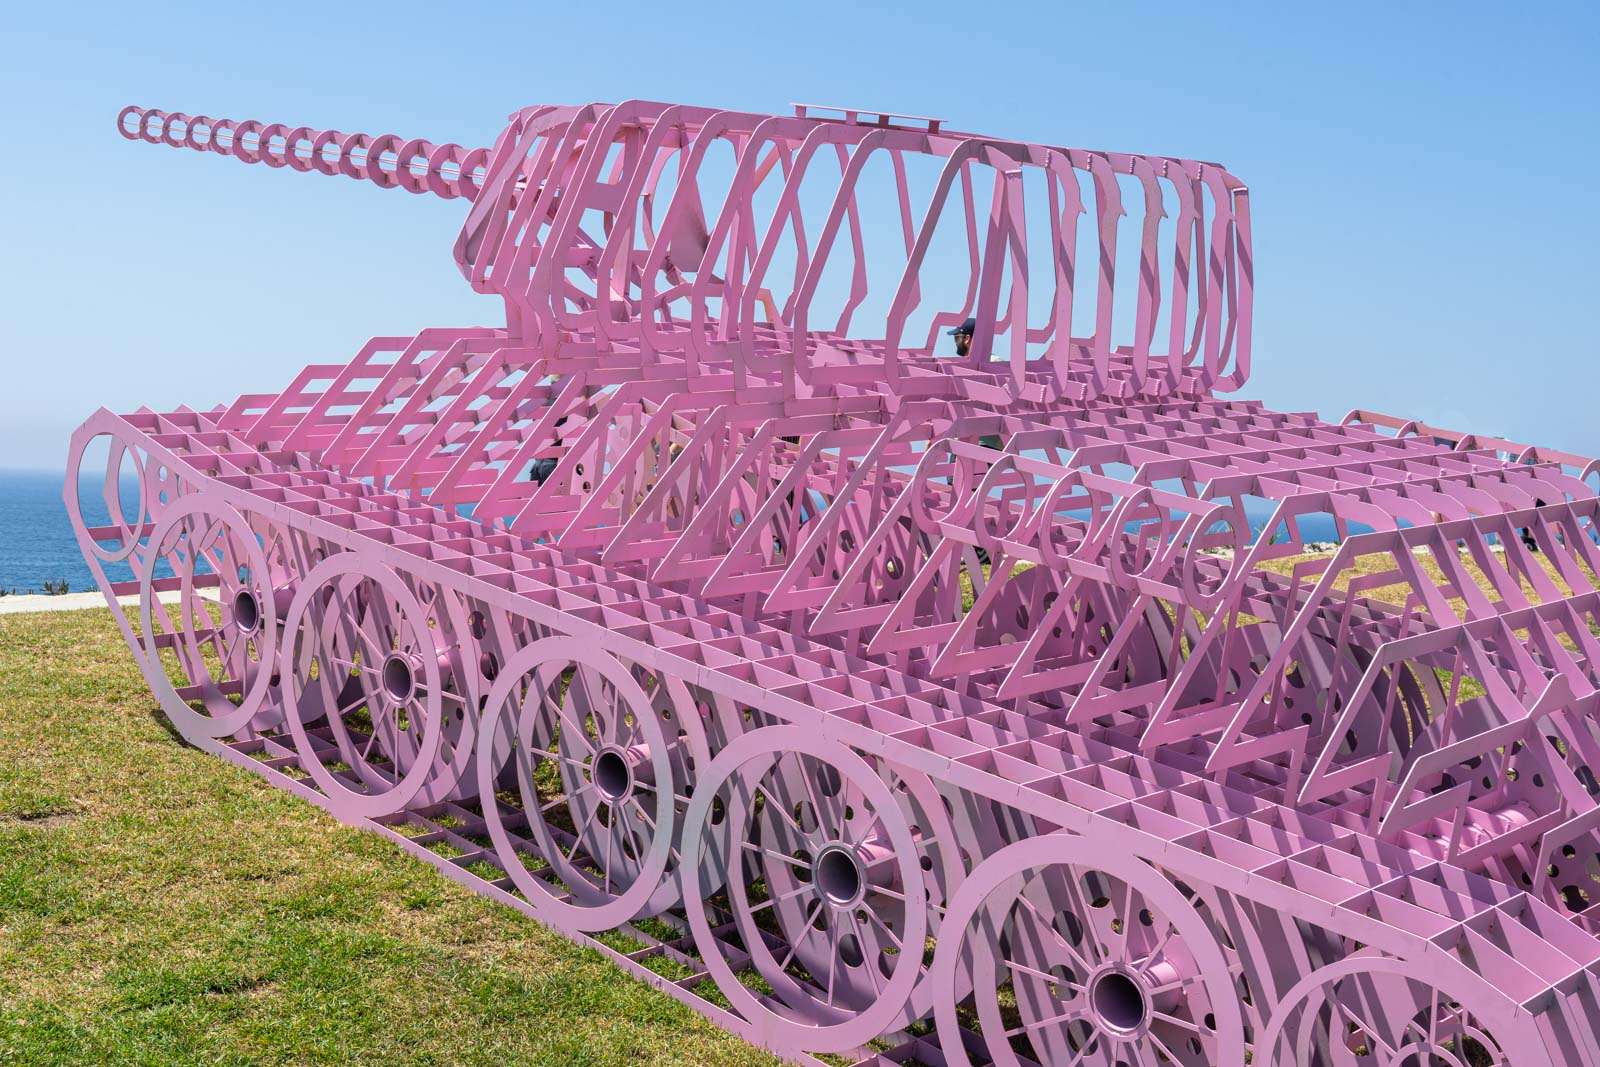 Sculpture by the Sea Bondi 2019